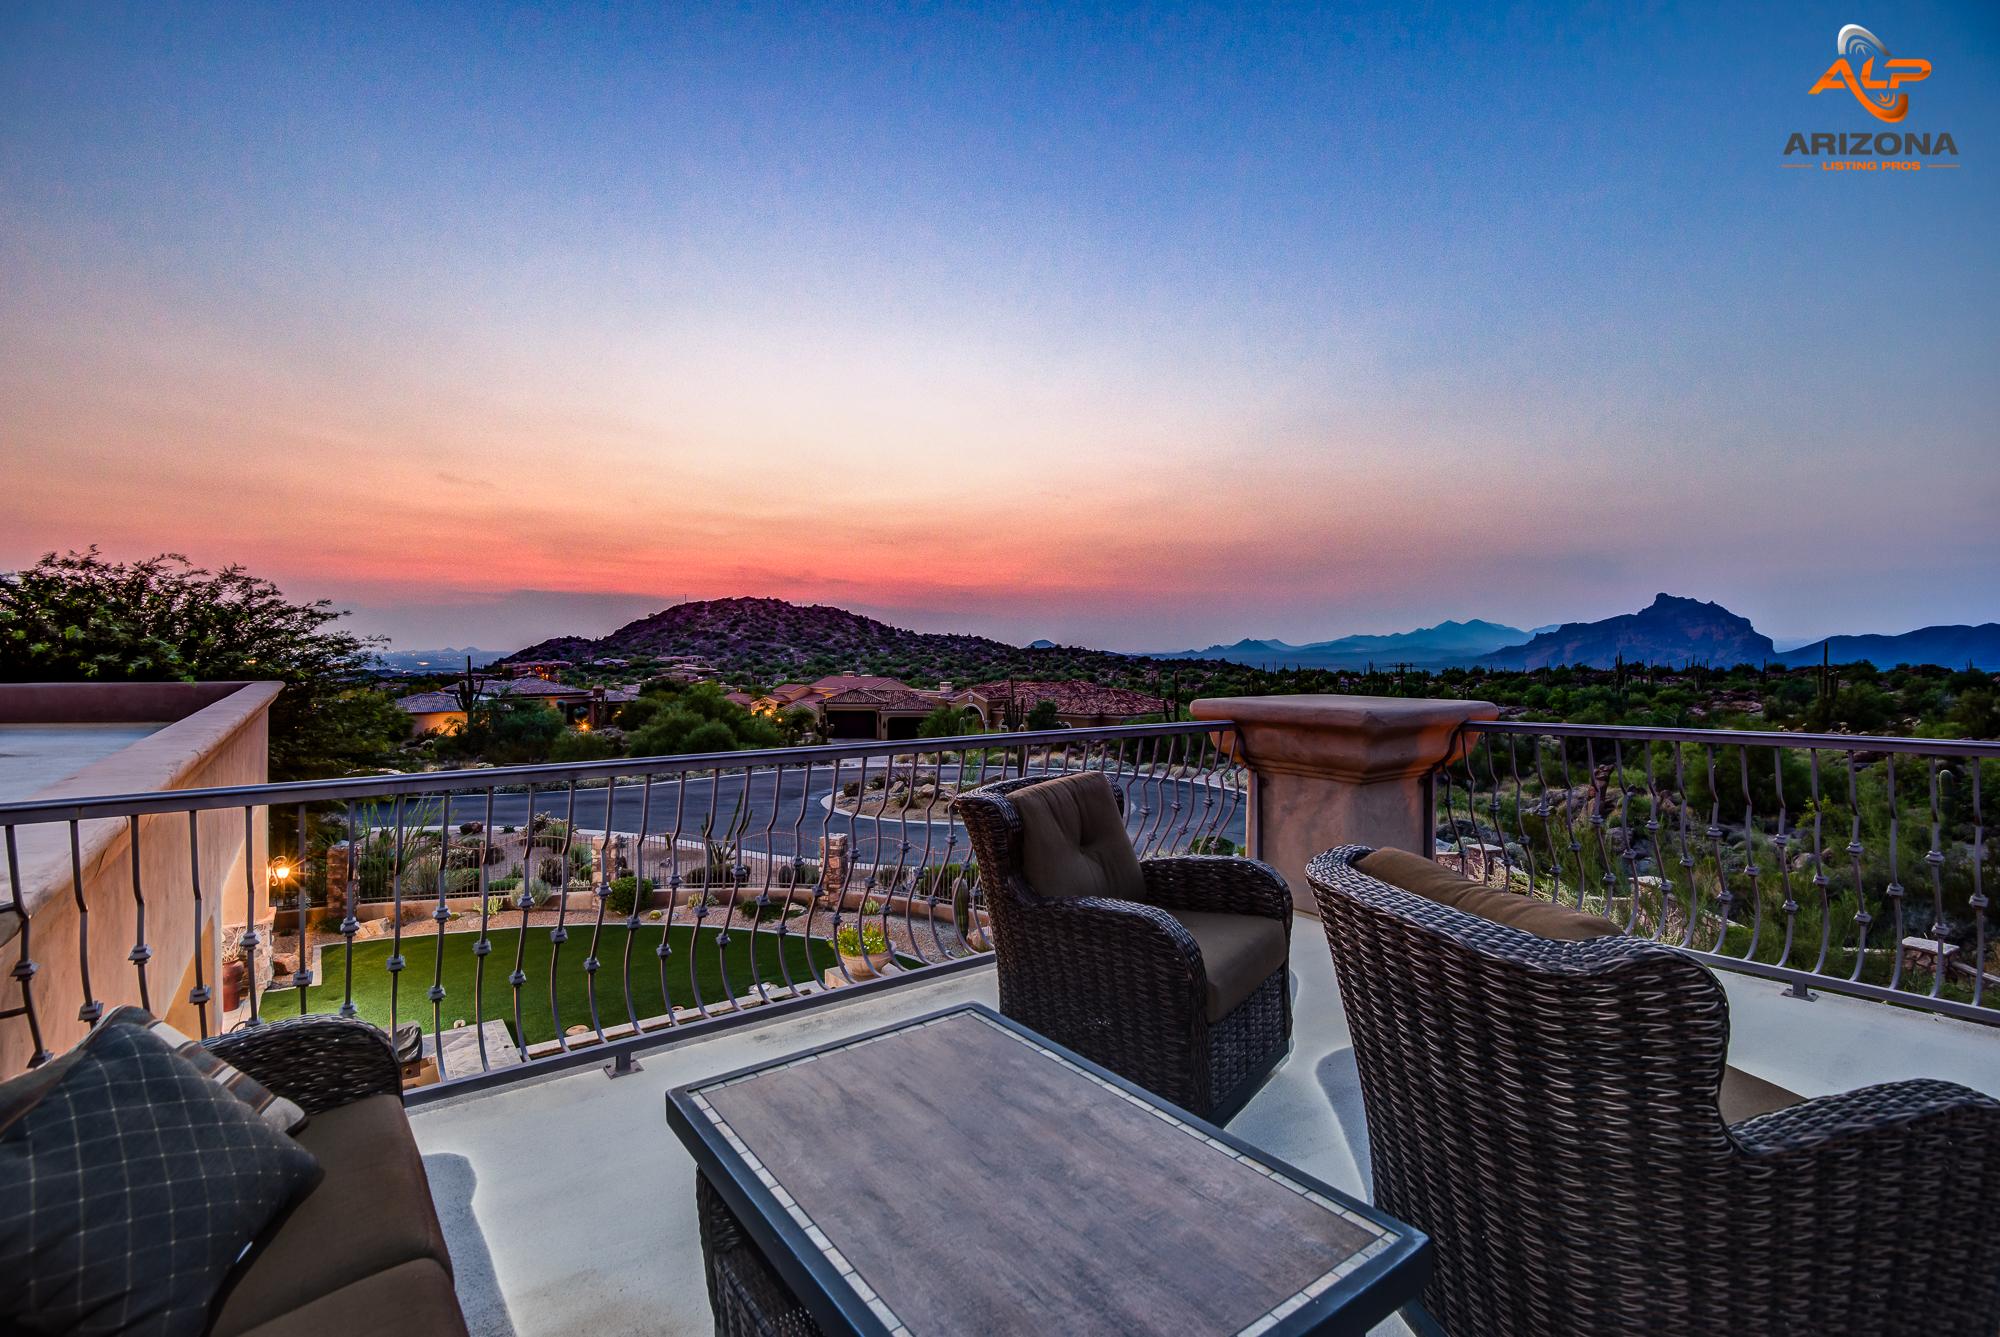 4323 North El Sereno Circle, Mesa, Arizona, My Home Group, DSC_9184, Arizona Listing Pros, Twighlight Photography, Luxury Real Estate Photography.jpg